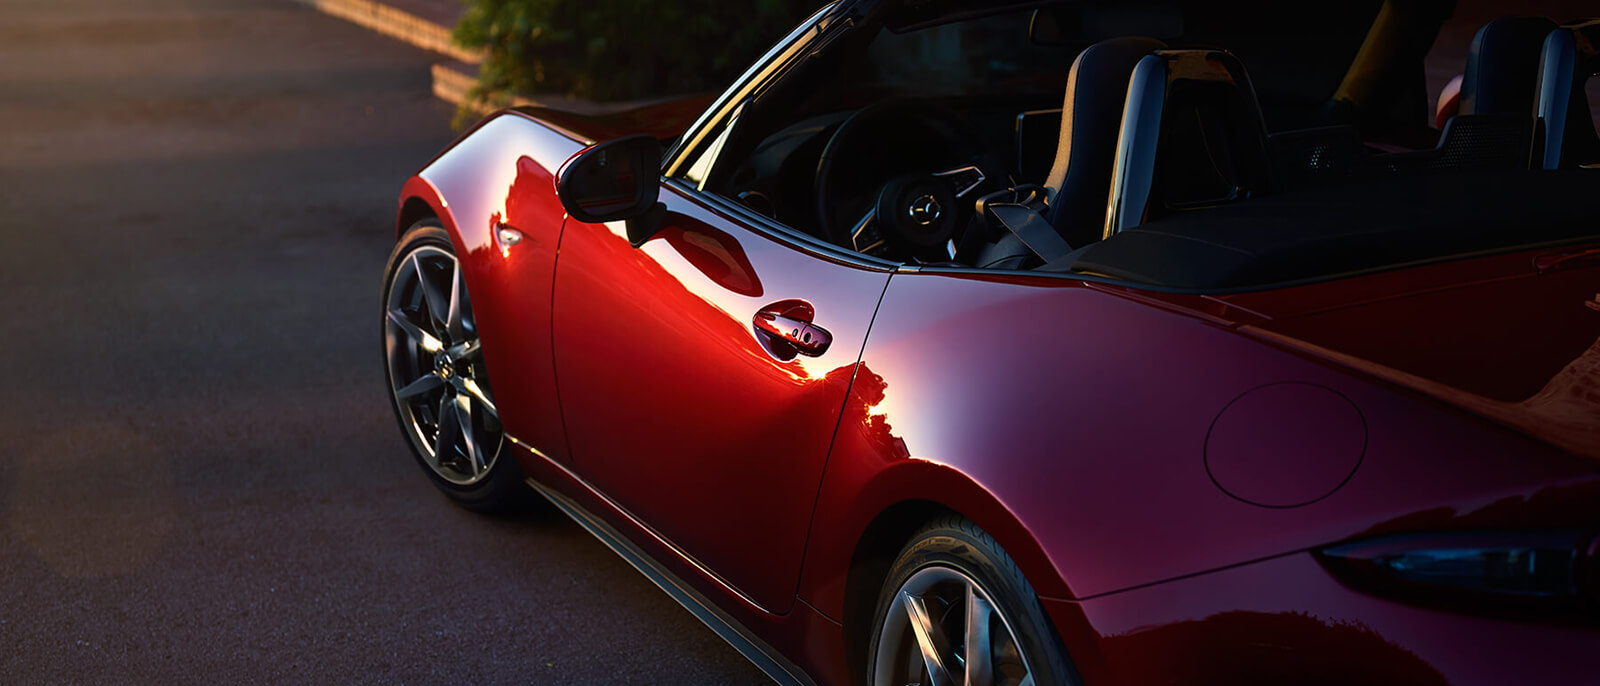 2016 Mazda MX-5 Miata Red